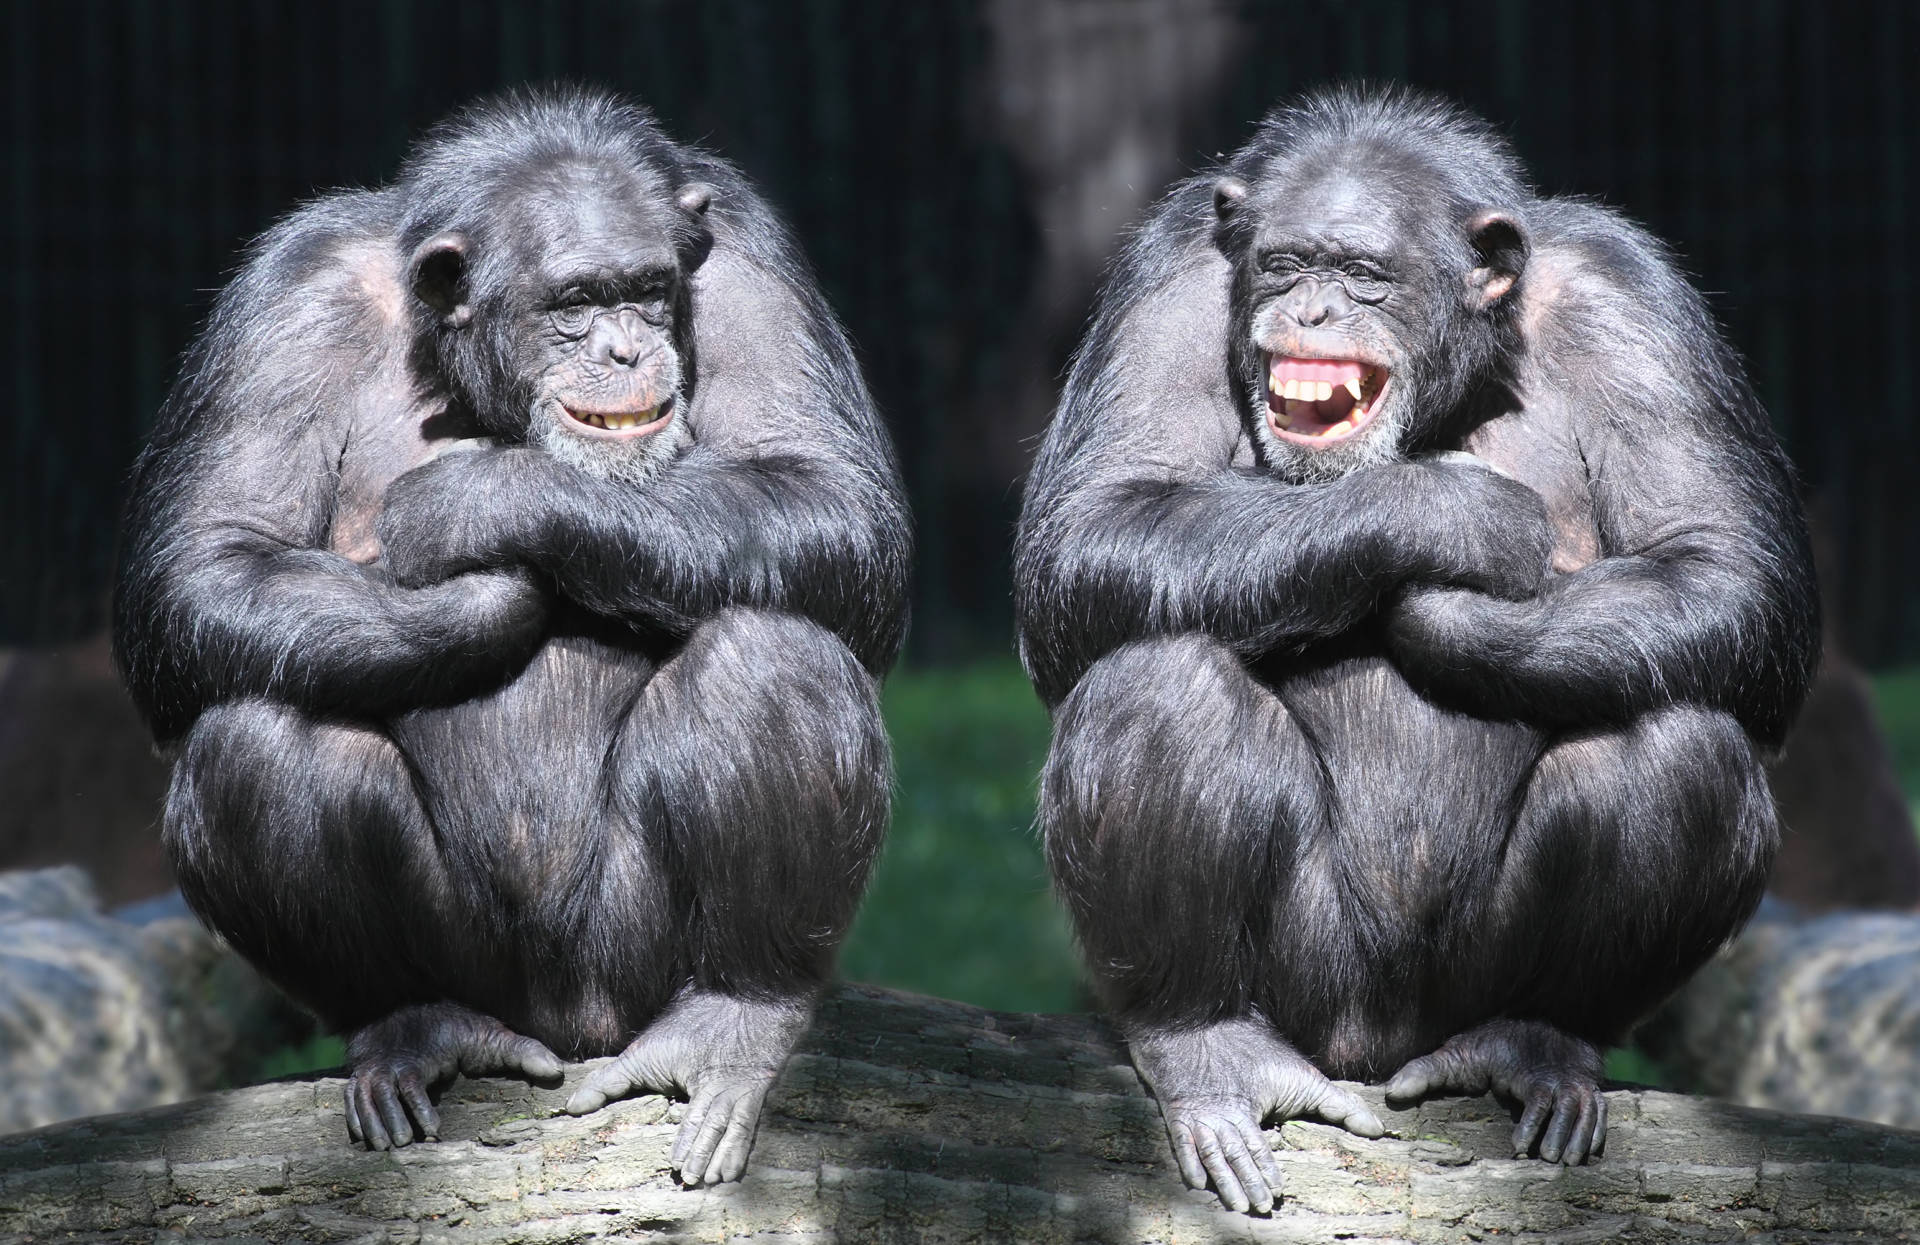 Stock image of two chimpanzees.